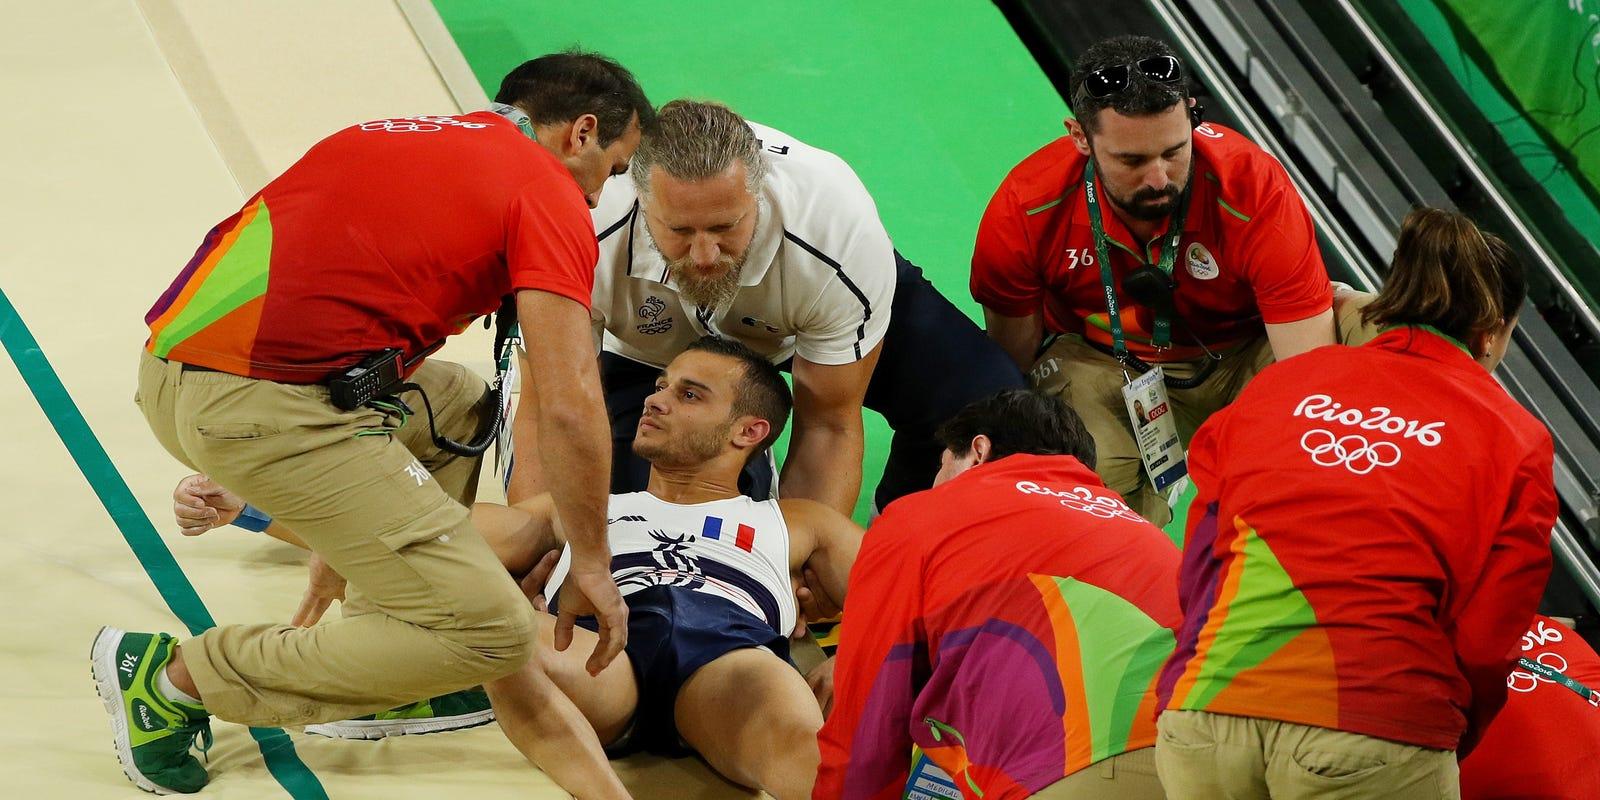 француз сломал ногу на олимпиаде фото как-нибудь- такую